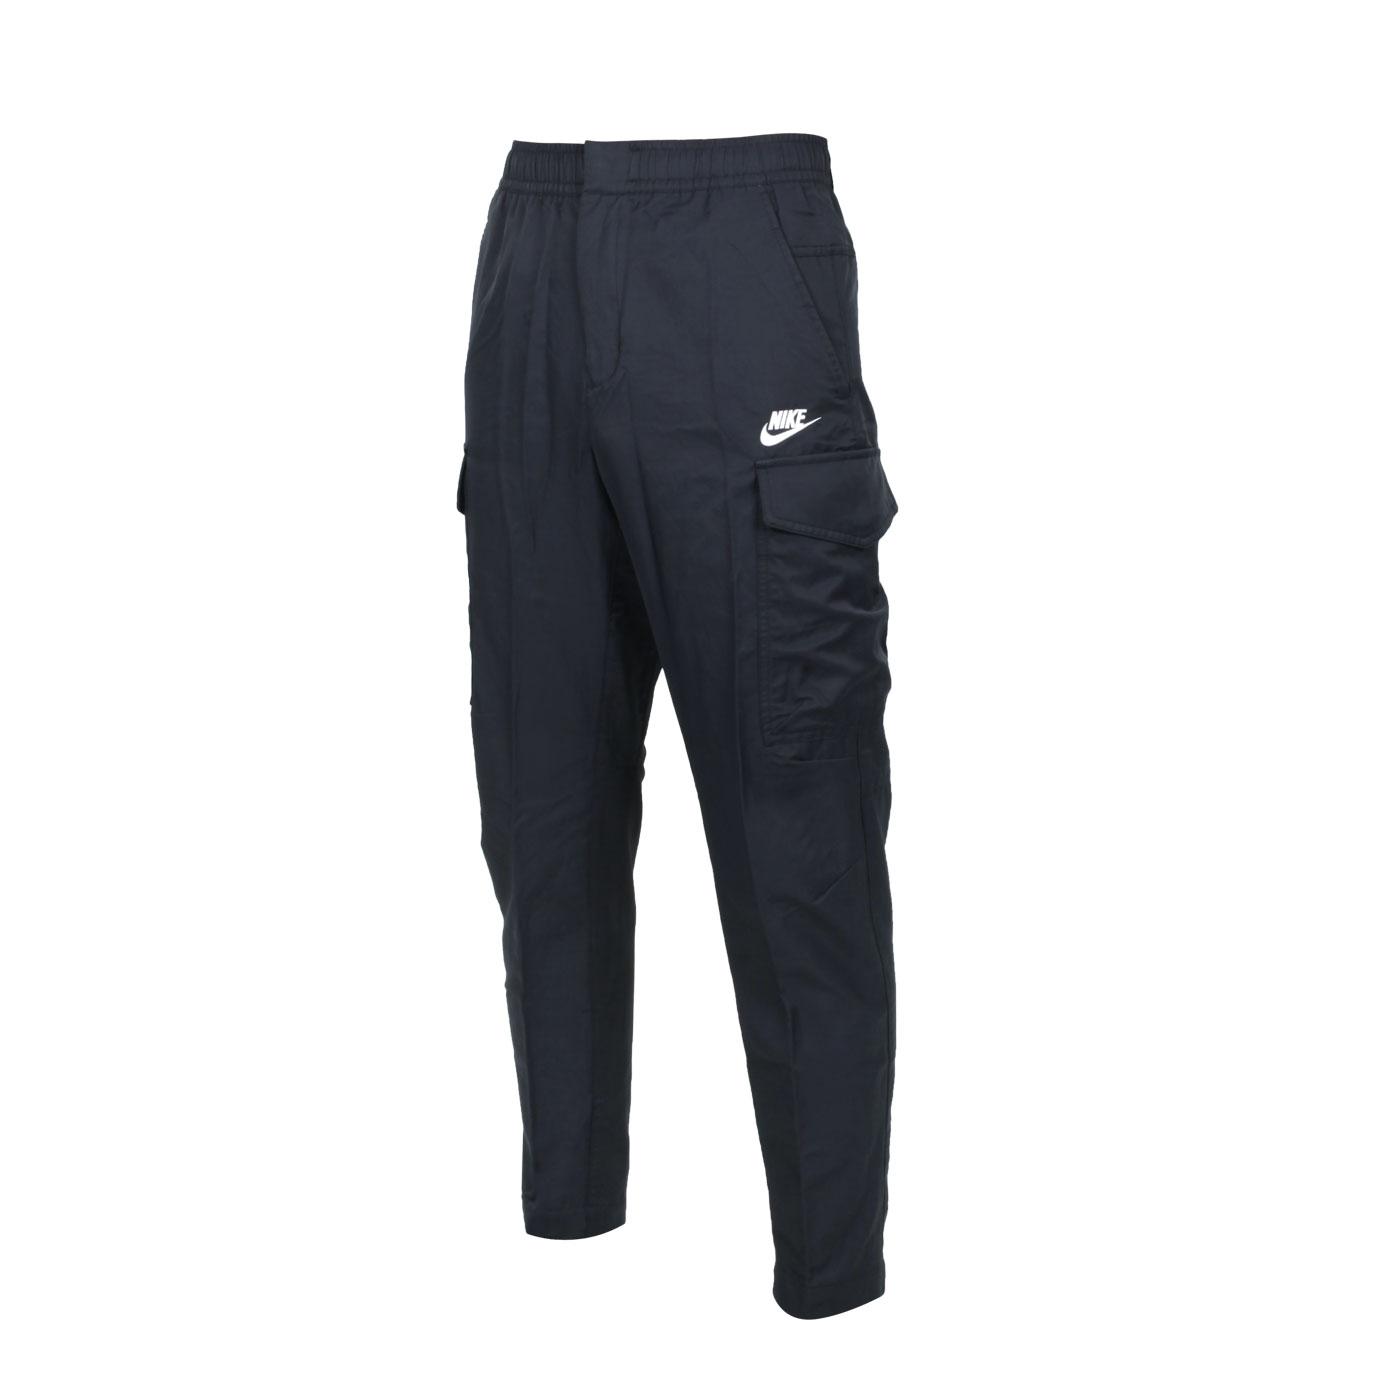 NIKE 男款訓練運動長褲 DD5208-010 - 黑白